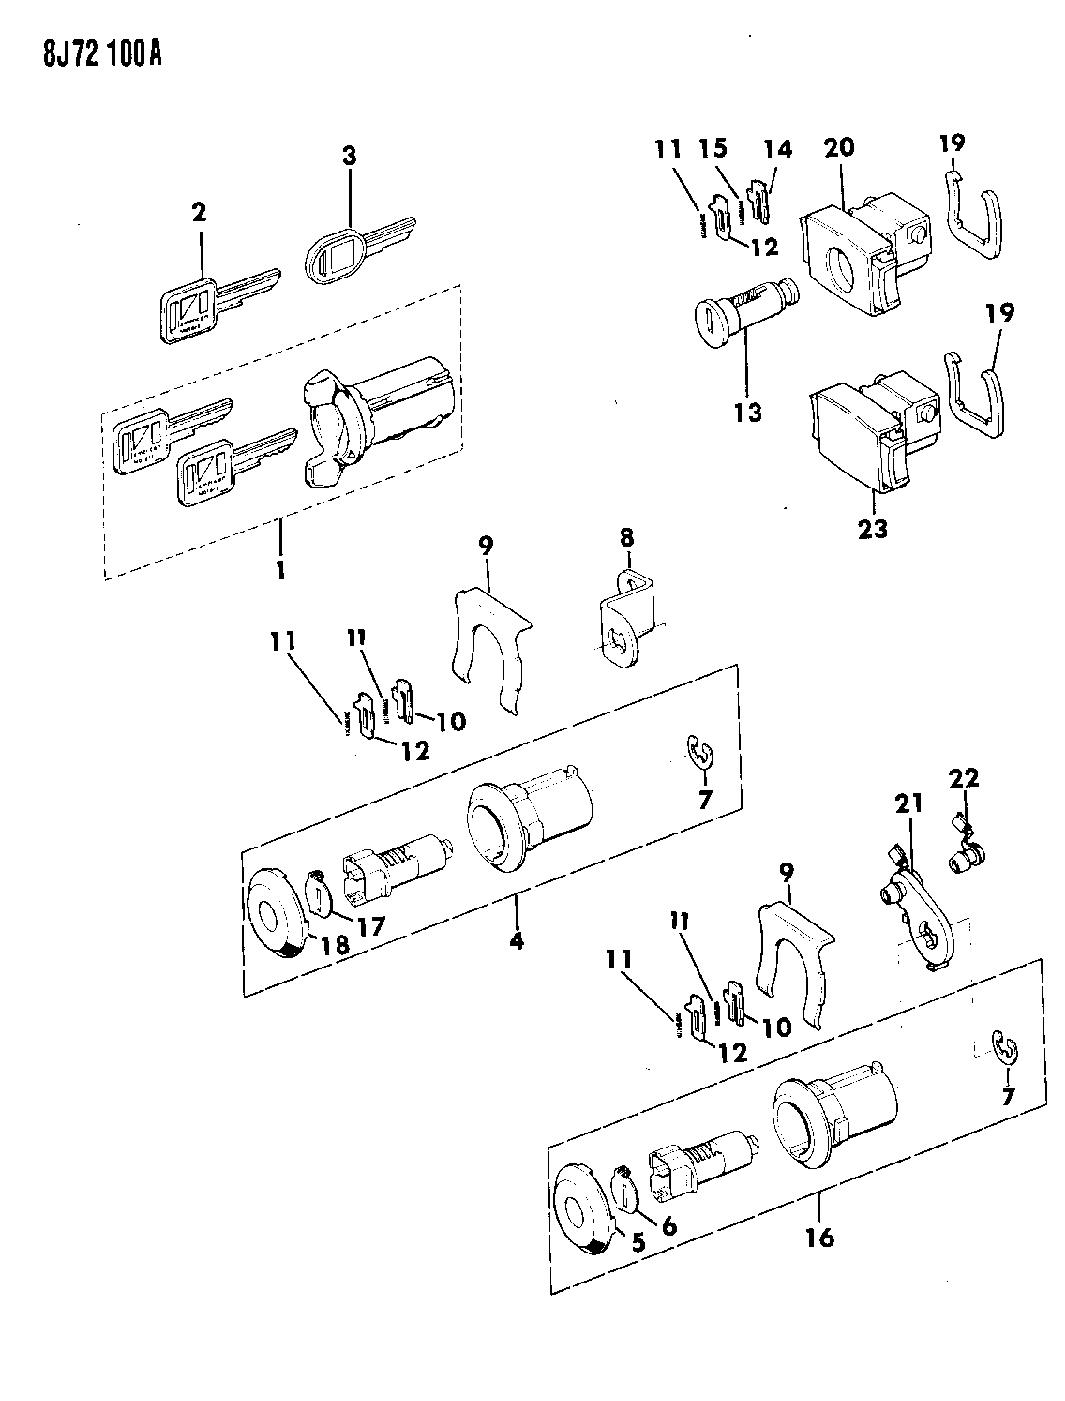 1987 Jeep Wrangler Cylinders U0026 Keys